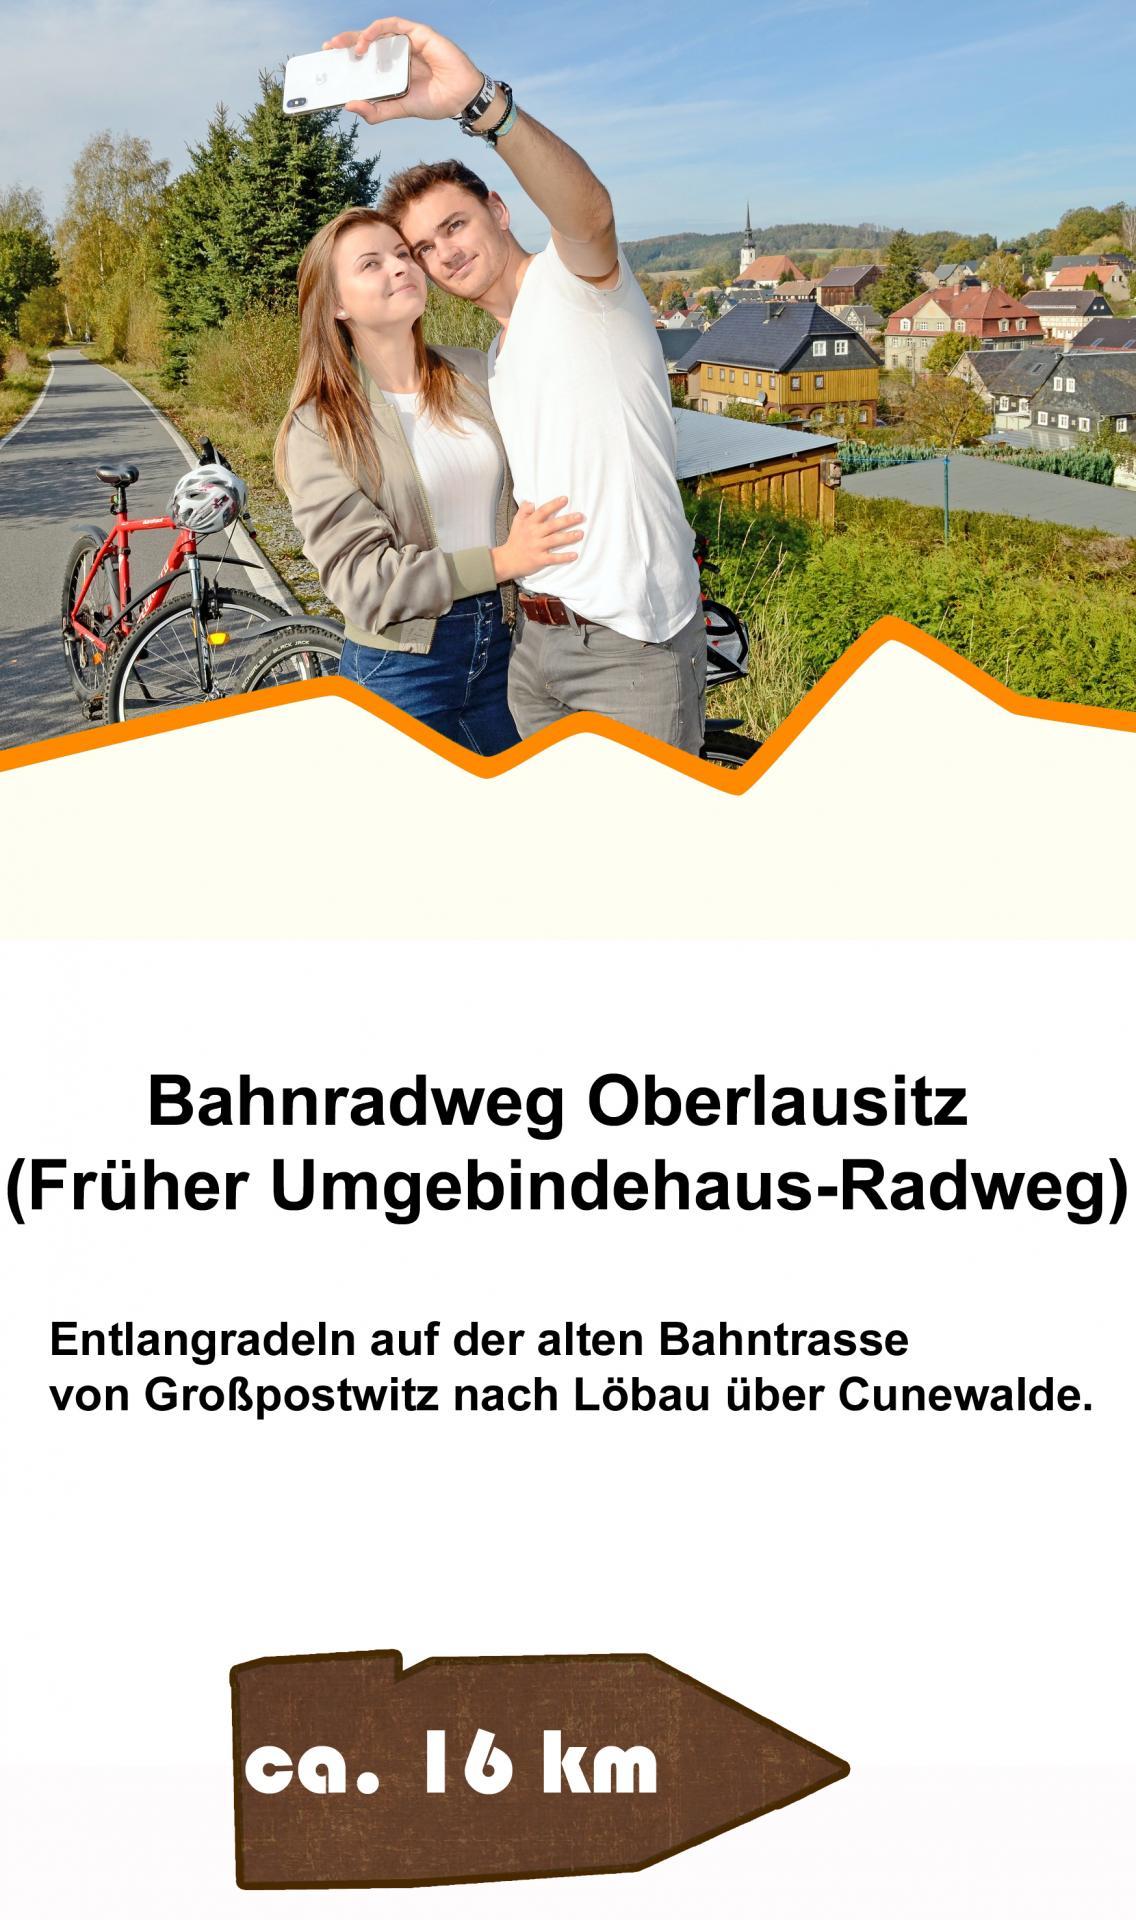 Bahnradweg Cunewalde